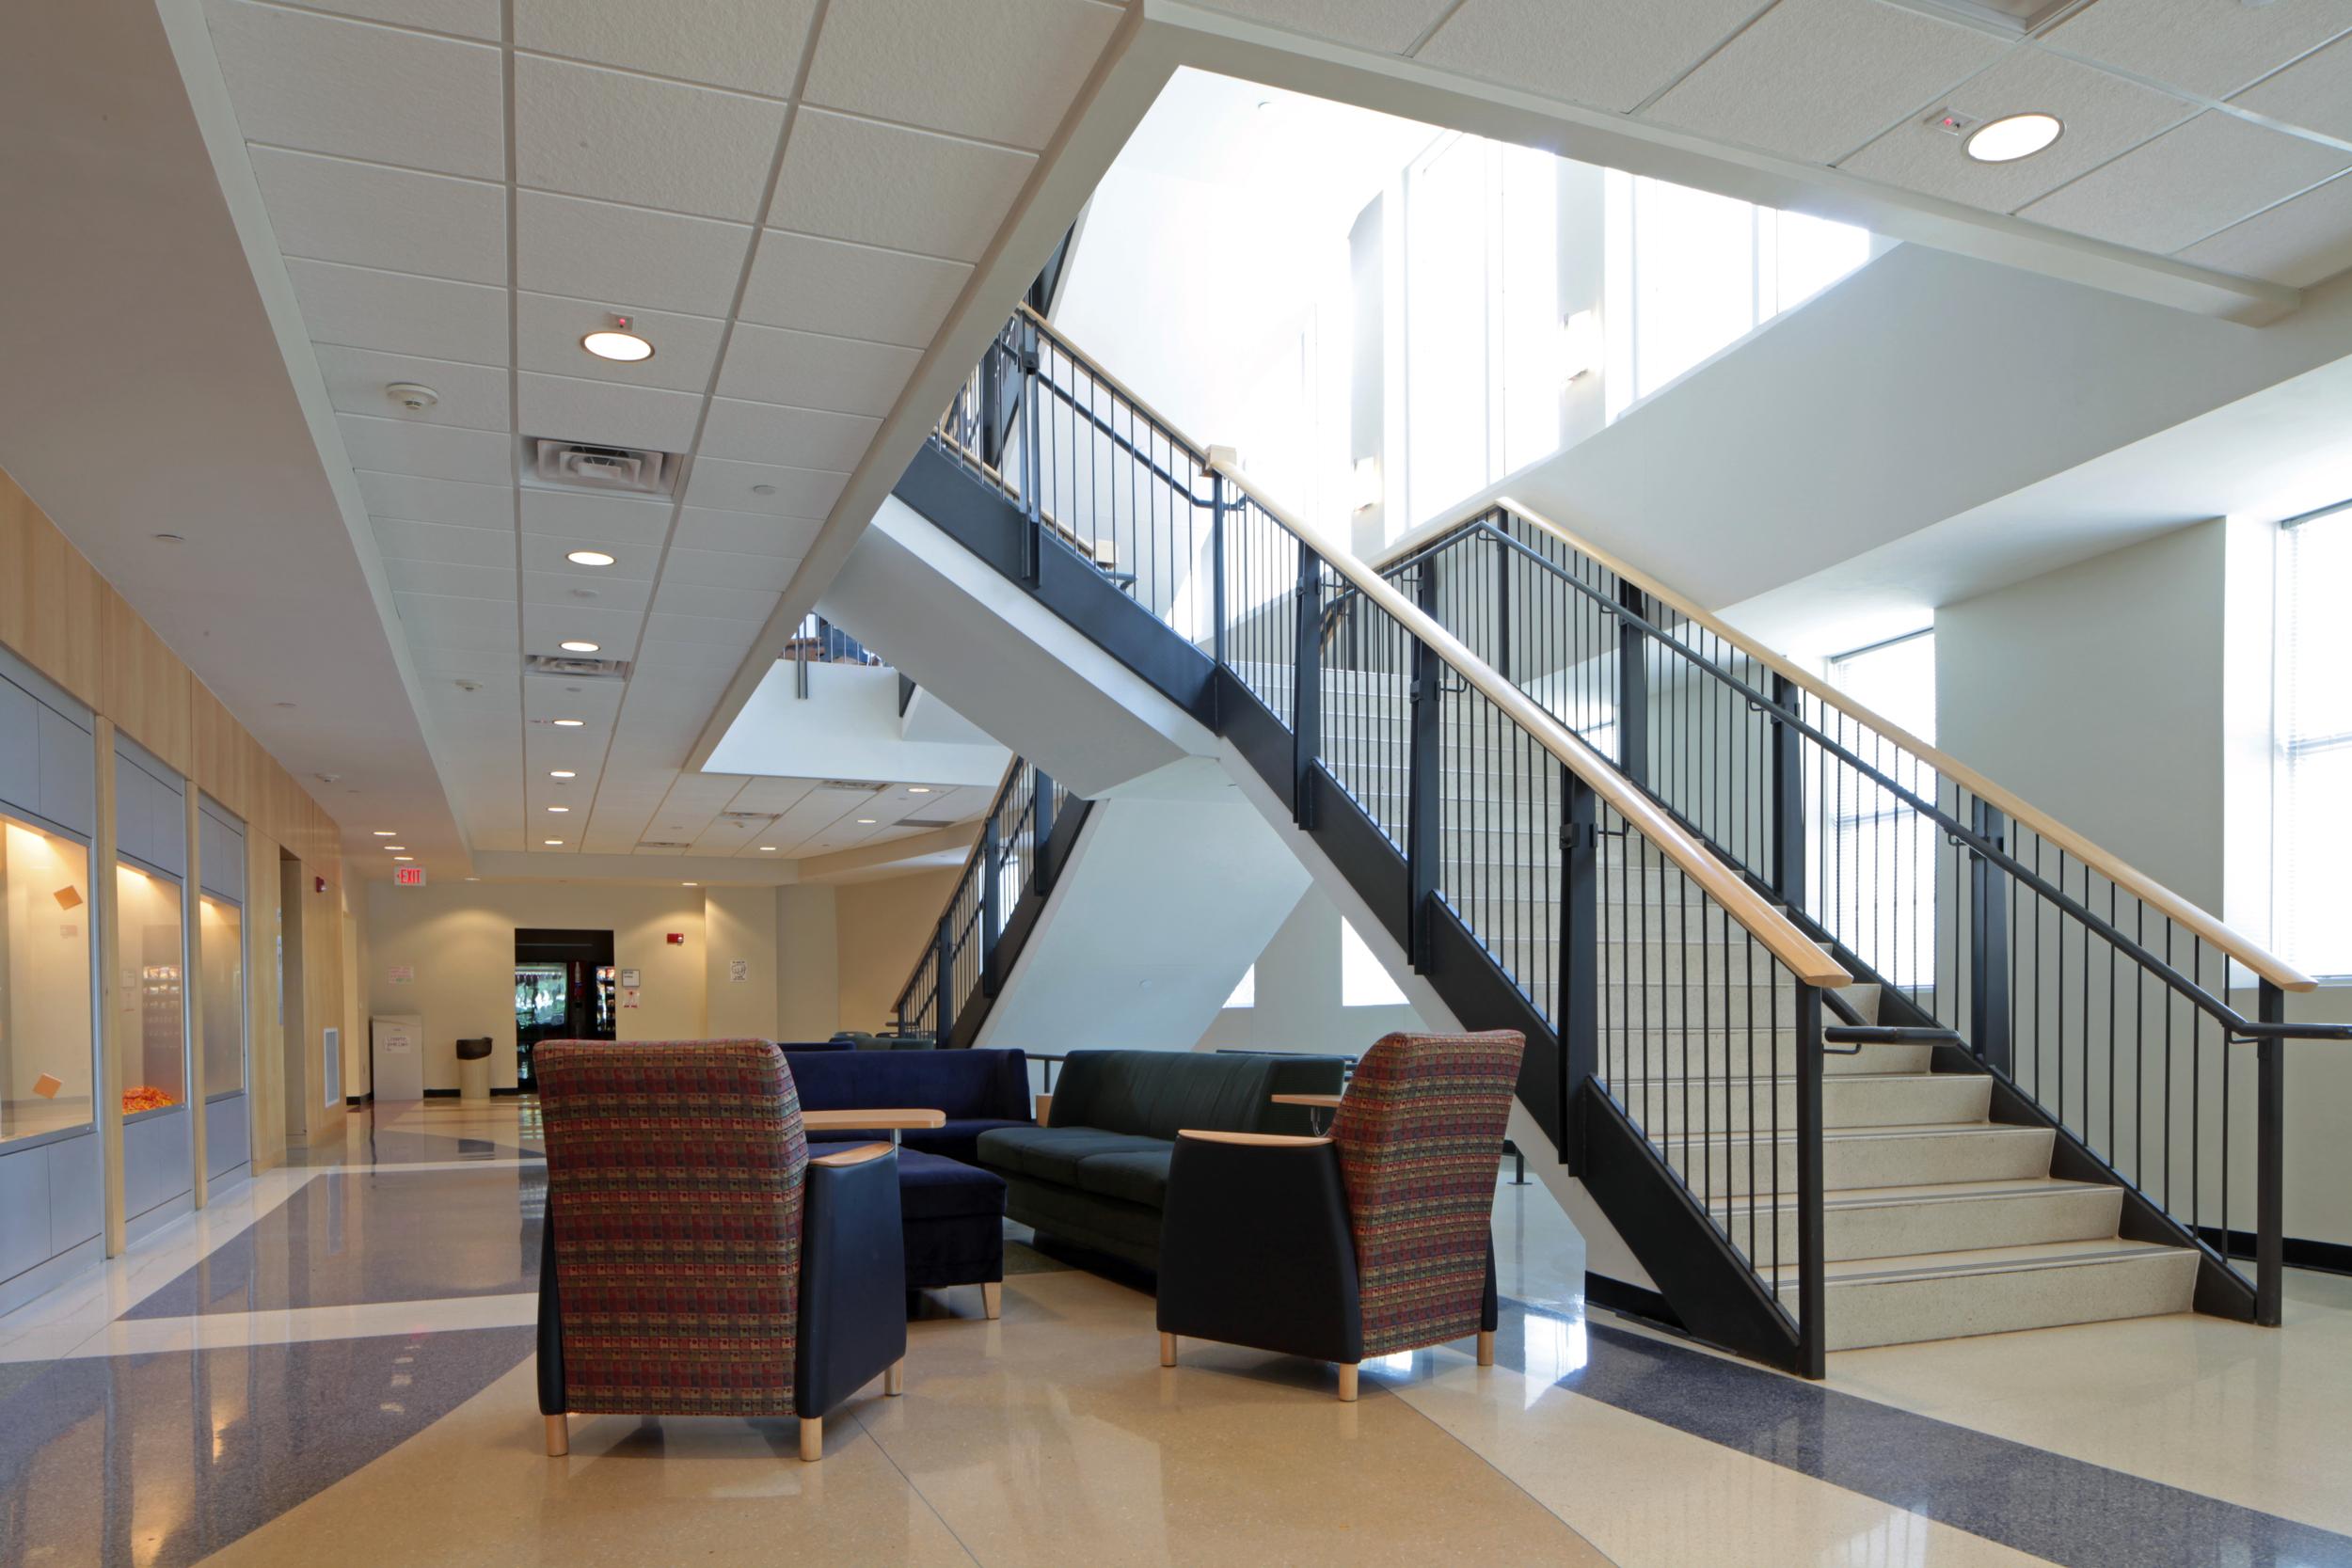 Hixson-Lied Stairway